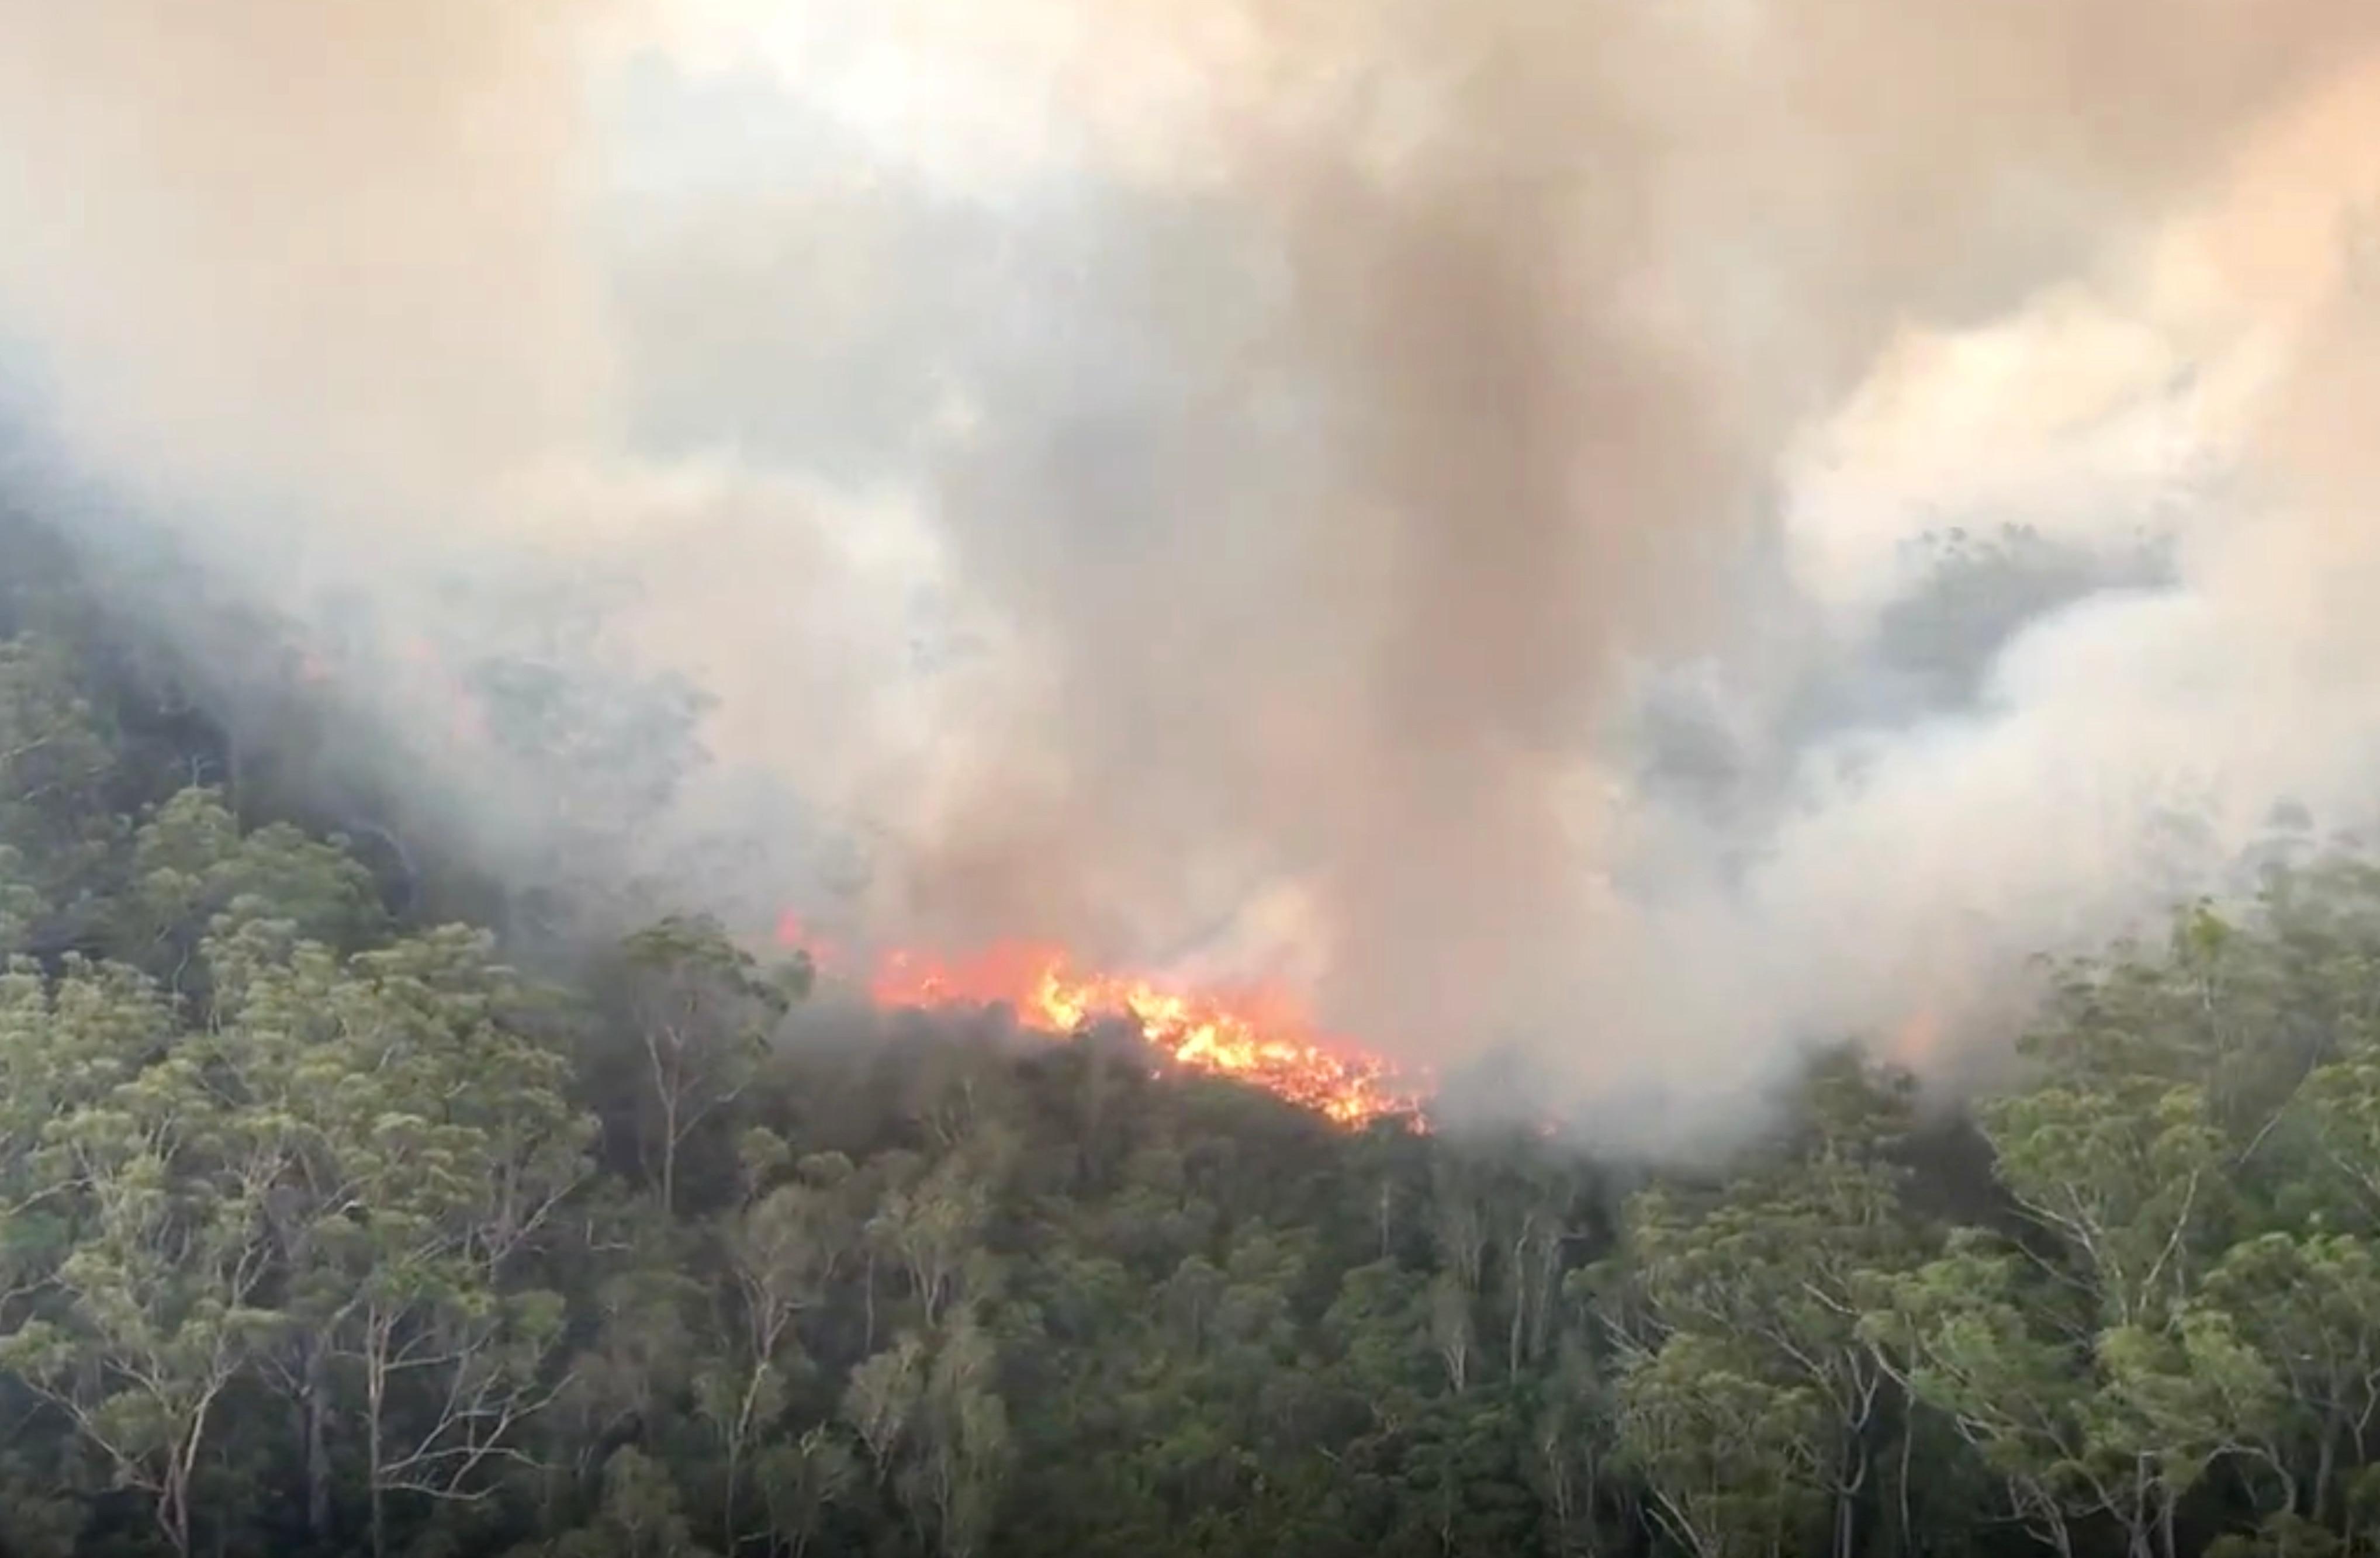 An aerial photo of the K'gari-Fraser Island fire captured on Wednesday, 2 December, 2020.